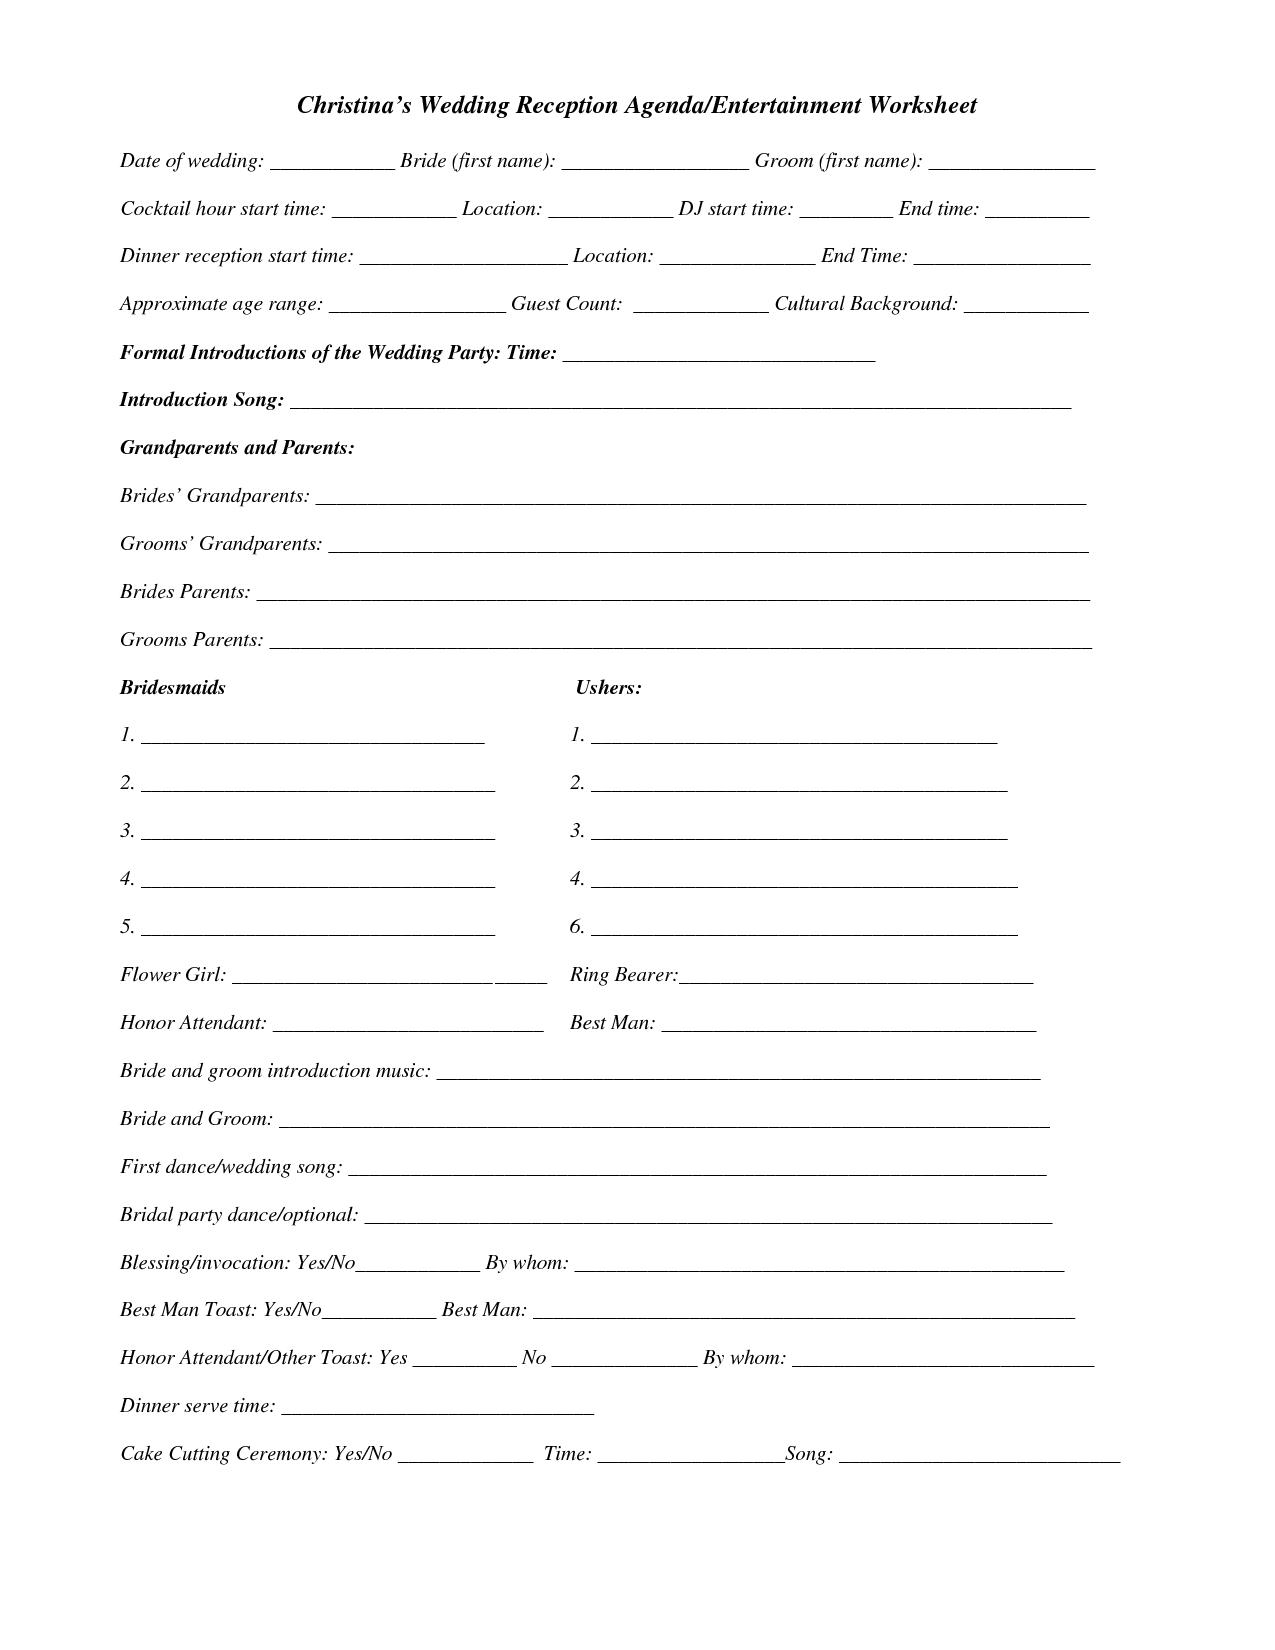 Dj Wedding Planner Printable Worksheets Quelles Astuces